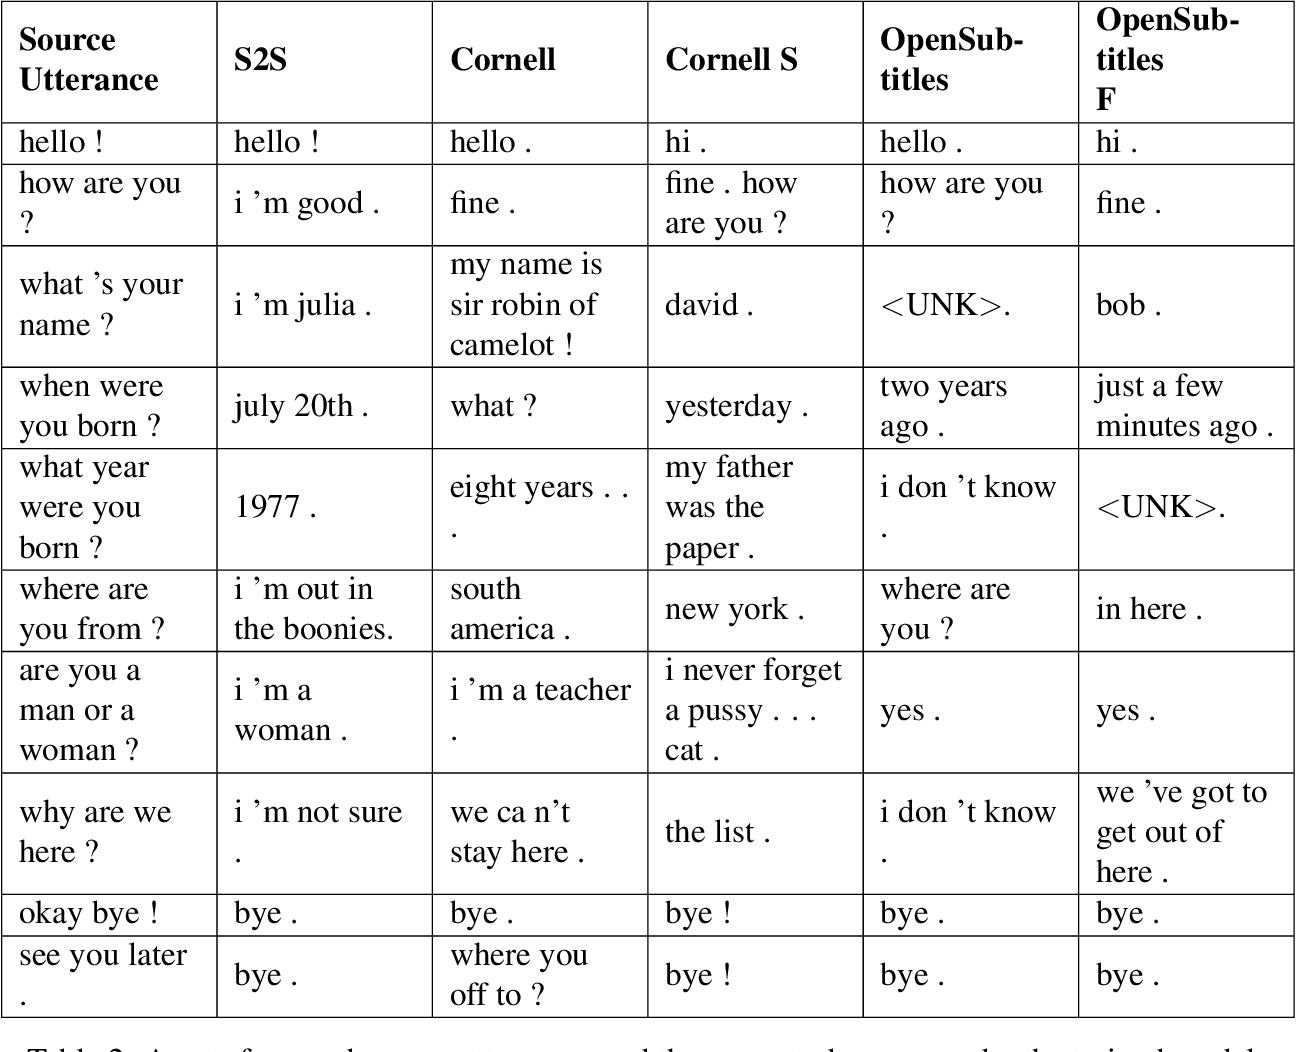 Figure 4 for Deep Learning Based Chatbot Models